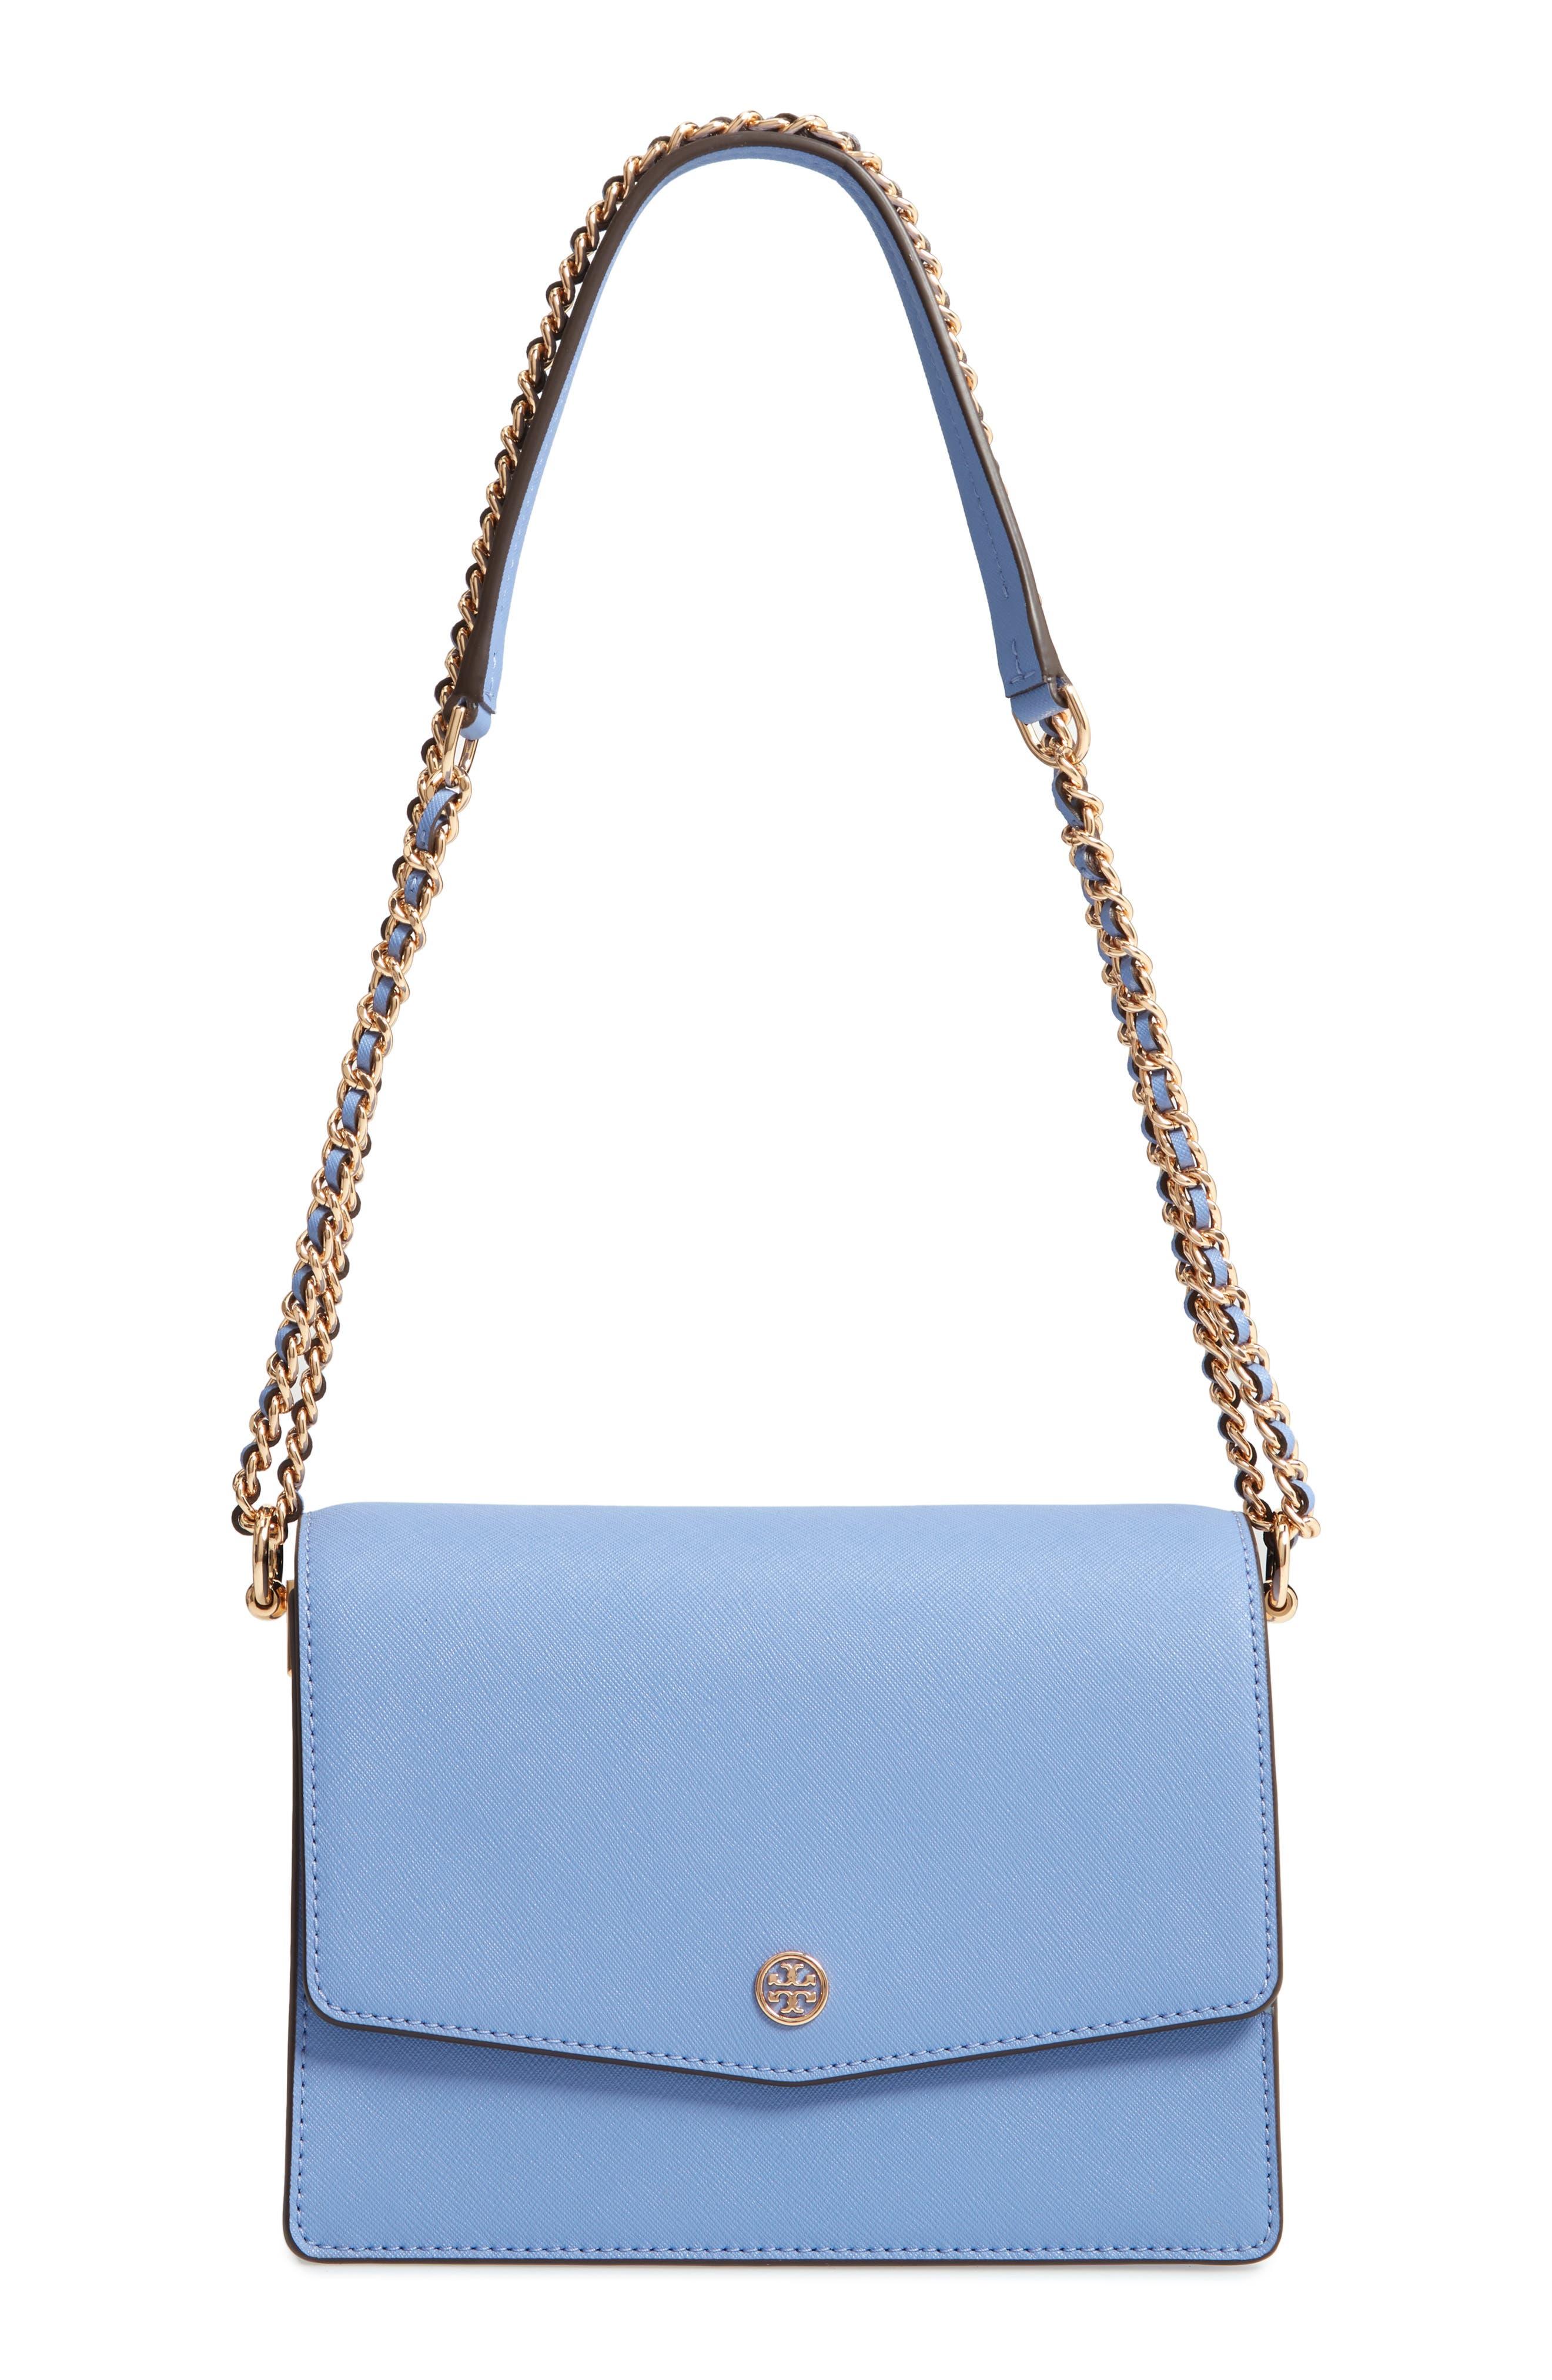 Robinson Convertible Leather Shoulder Bag,                             Alternate thumbnail 5, color,                             Bow Blue